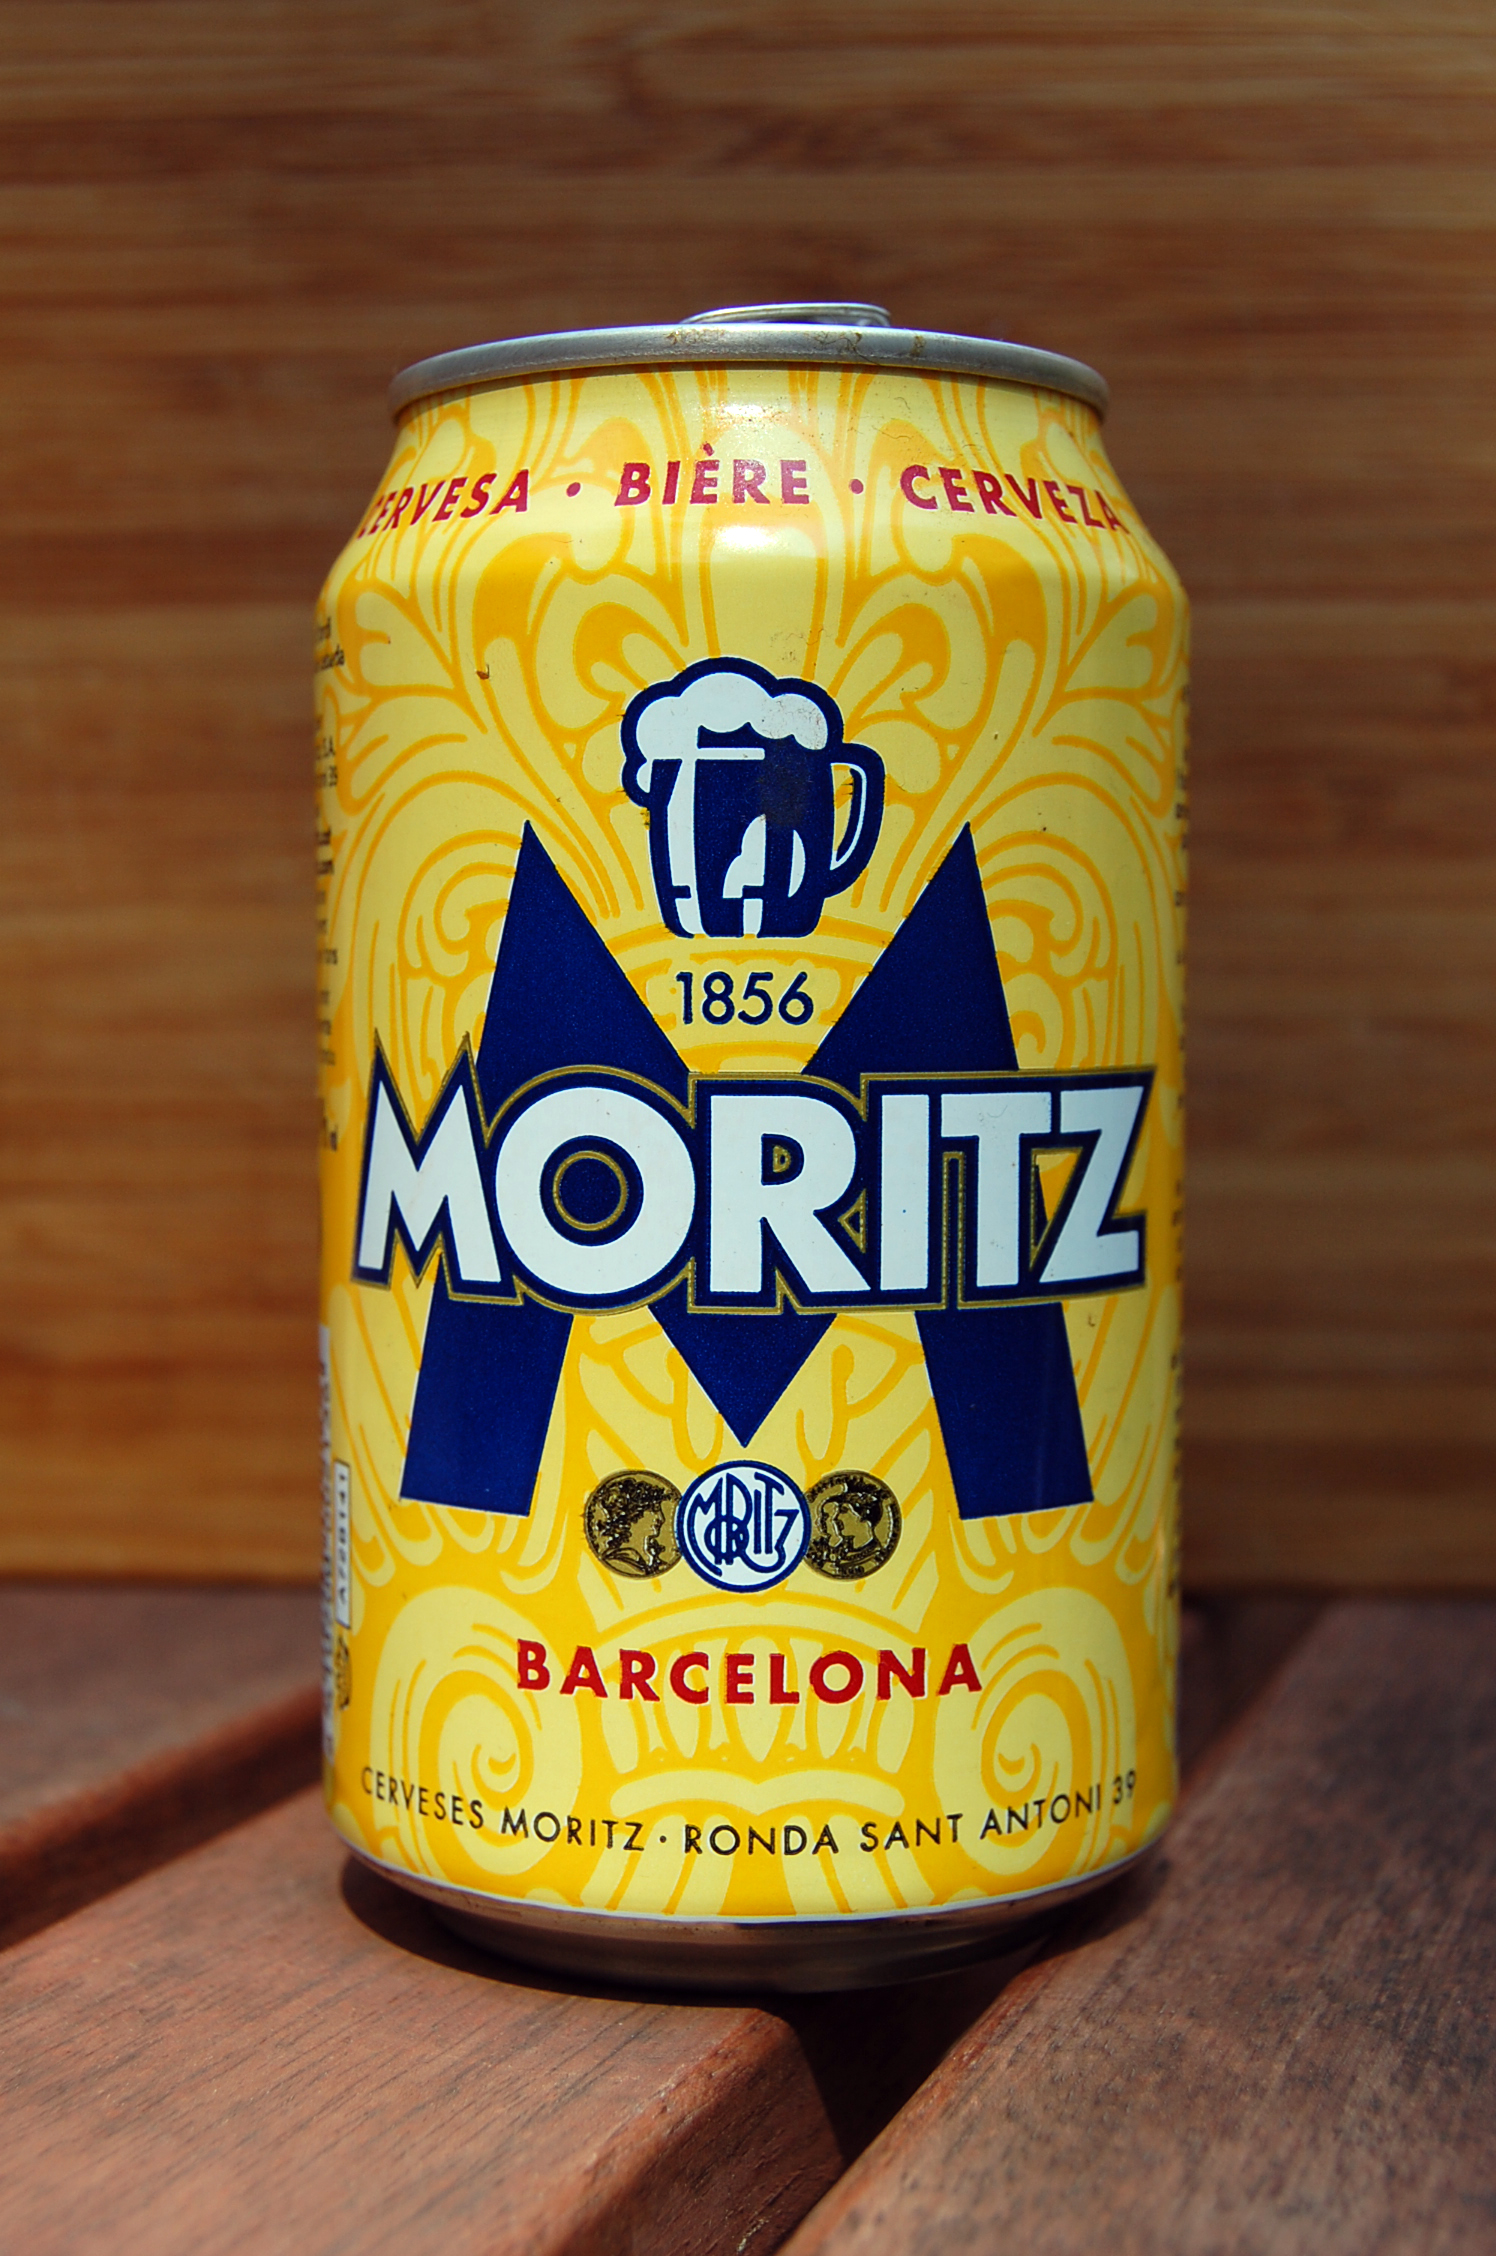 Opiniones de moritz cerveza - Moritz ronda sant antoni ...